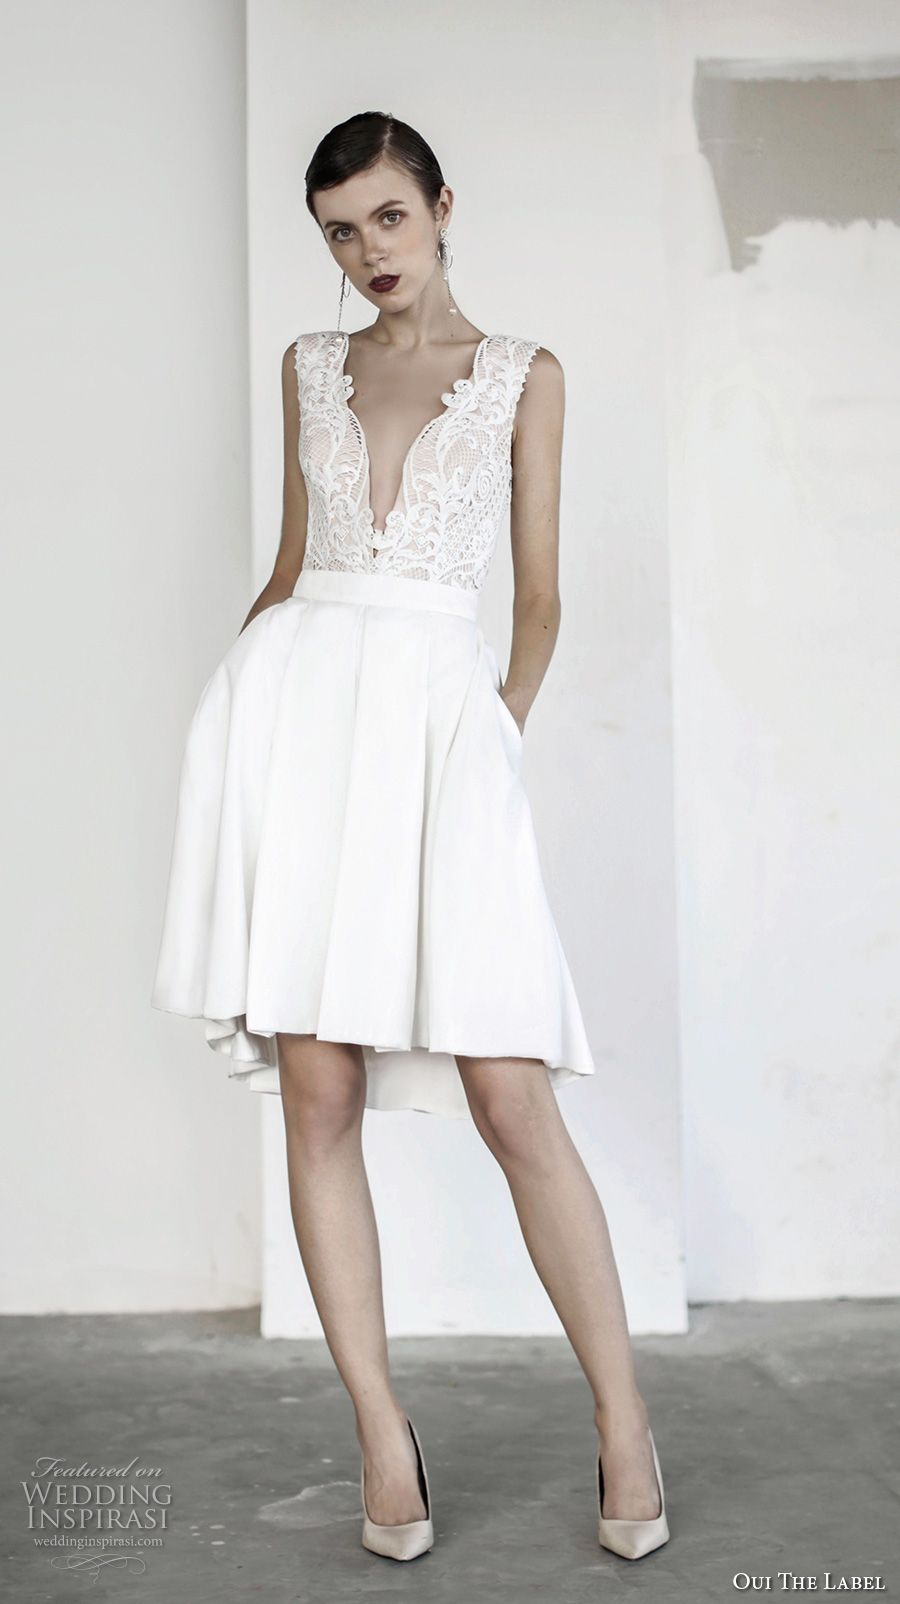 Oui The Label 2017 Wedding Dresses New Romantics Bridal Wedding Inspirasi Wedding Dress With Pockets Short Wedding Dress Plain Wedding Dress [ 1604 x 900 Pixel ]